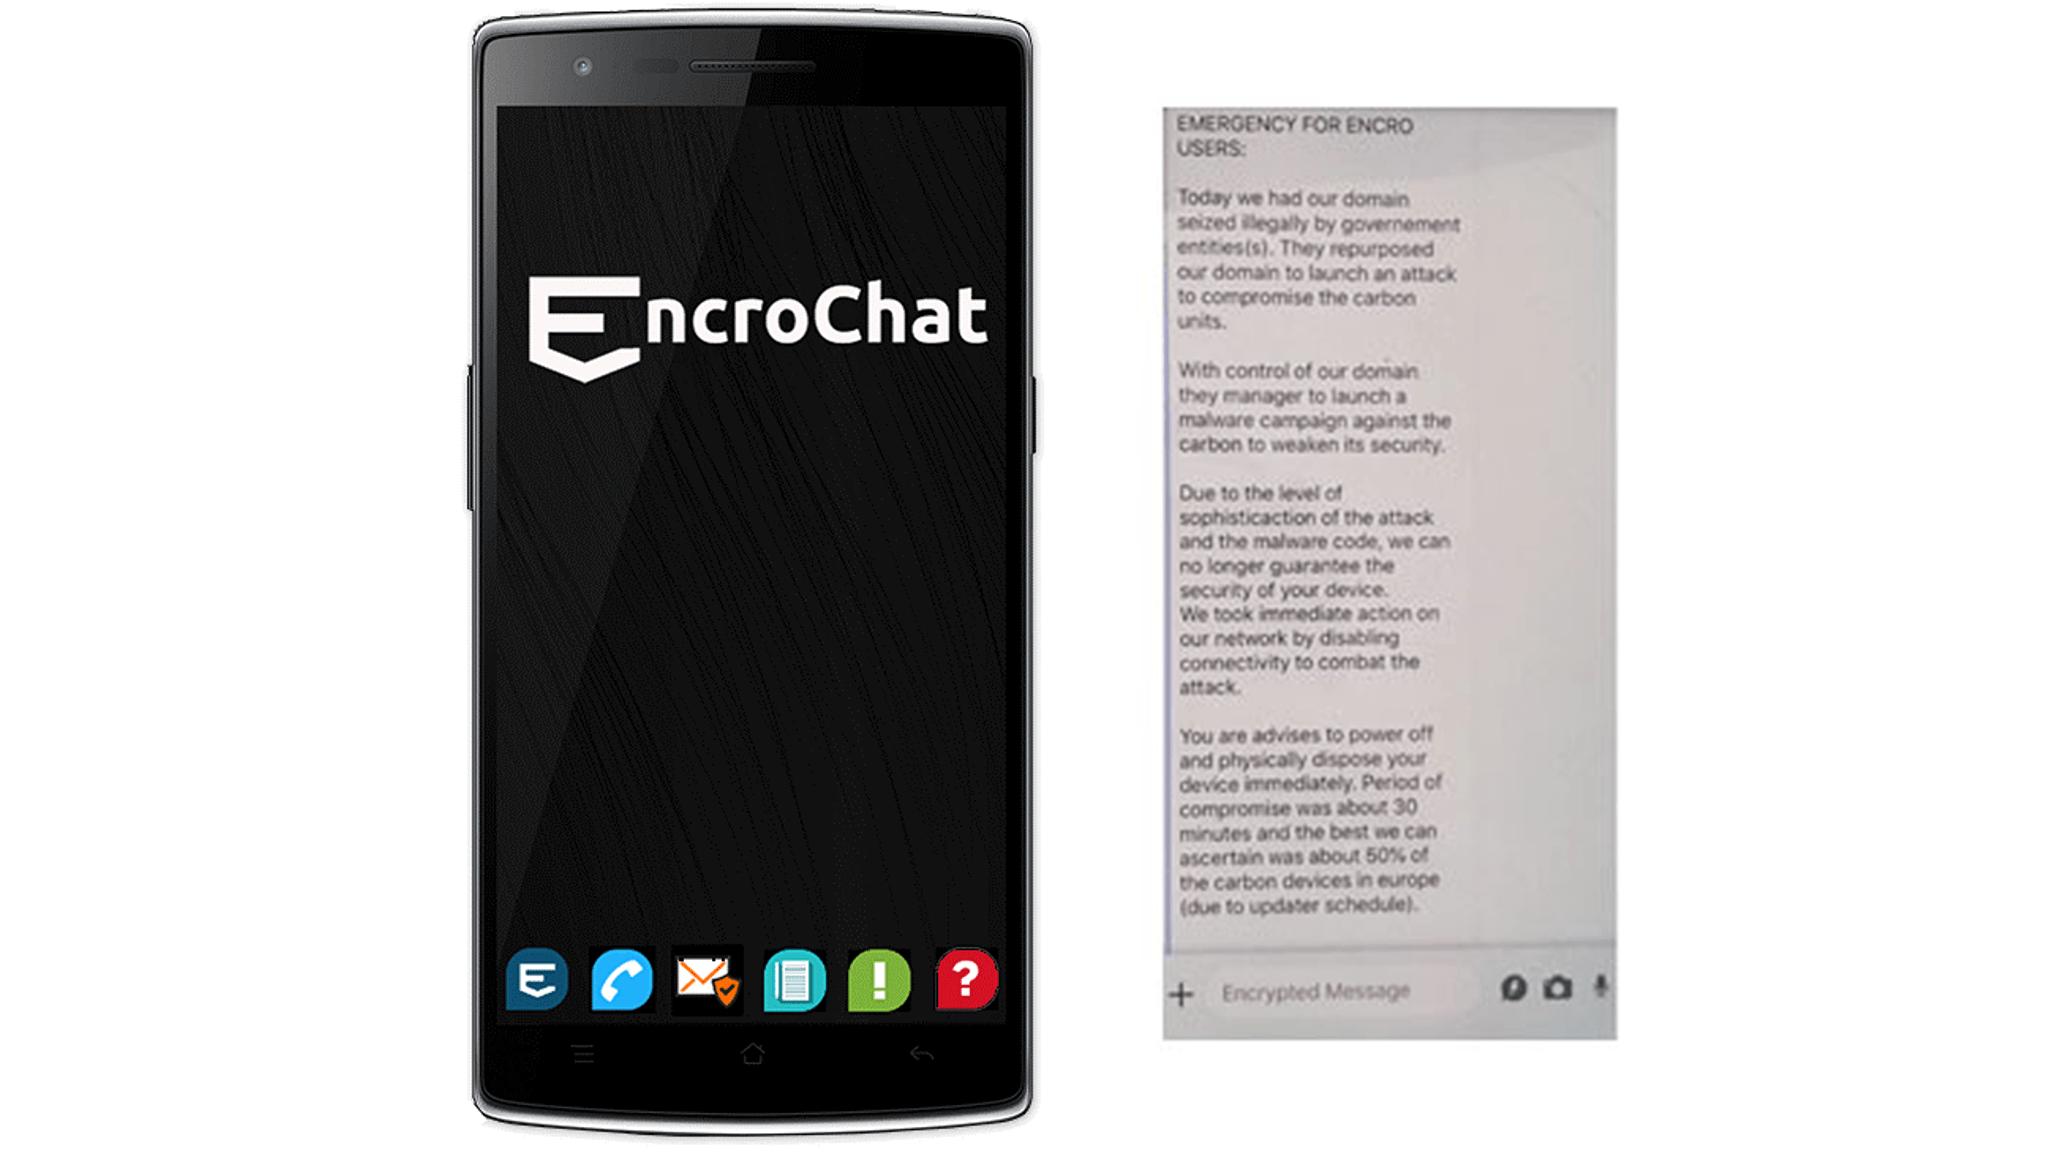 EncroChat Encrypted Phone hacked - Weening Strafrechtadvocaten